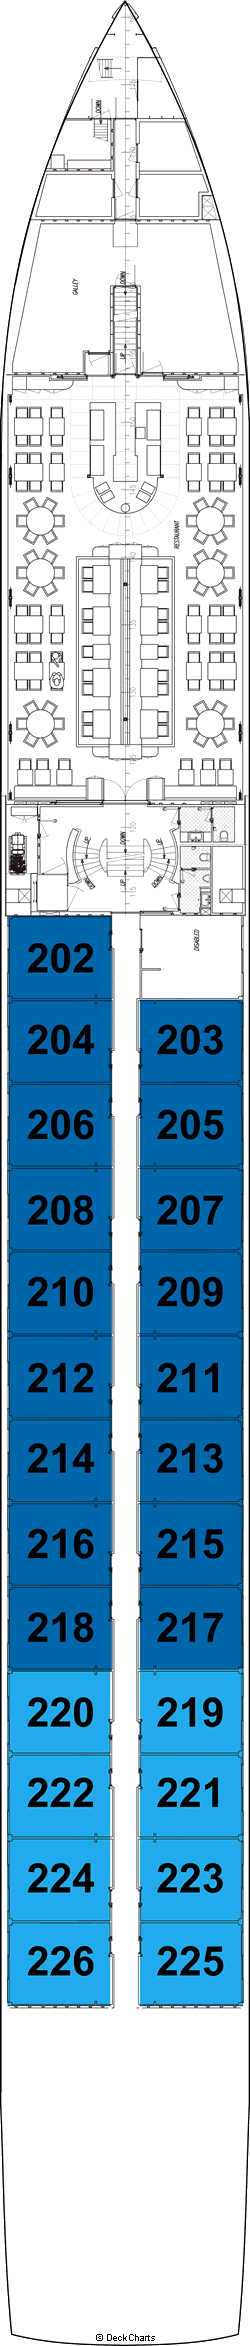 Avalon Visionary: Sapphire Deck